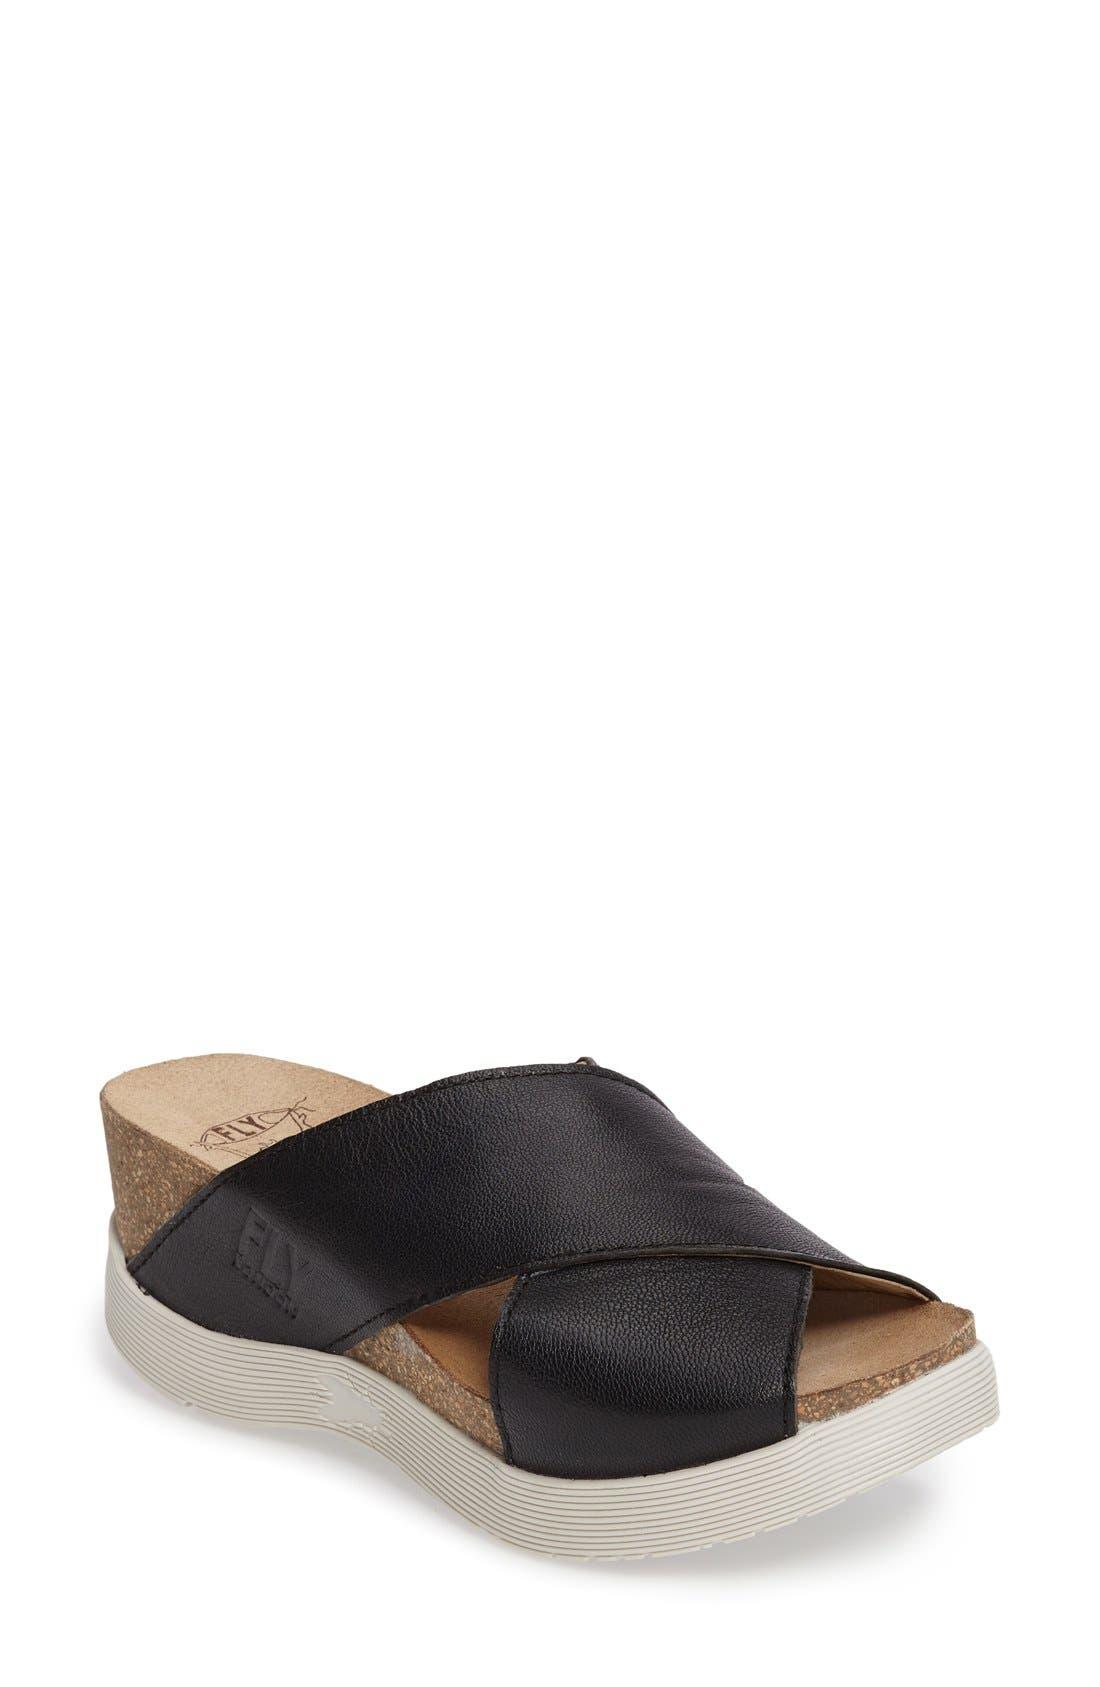 Alternate Image 1 Selected - Fly London Wary Platform Sandal (Women)